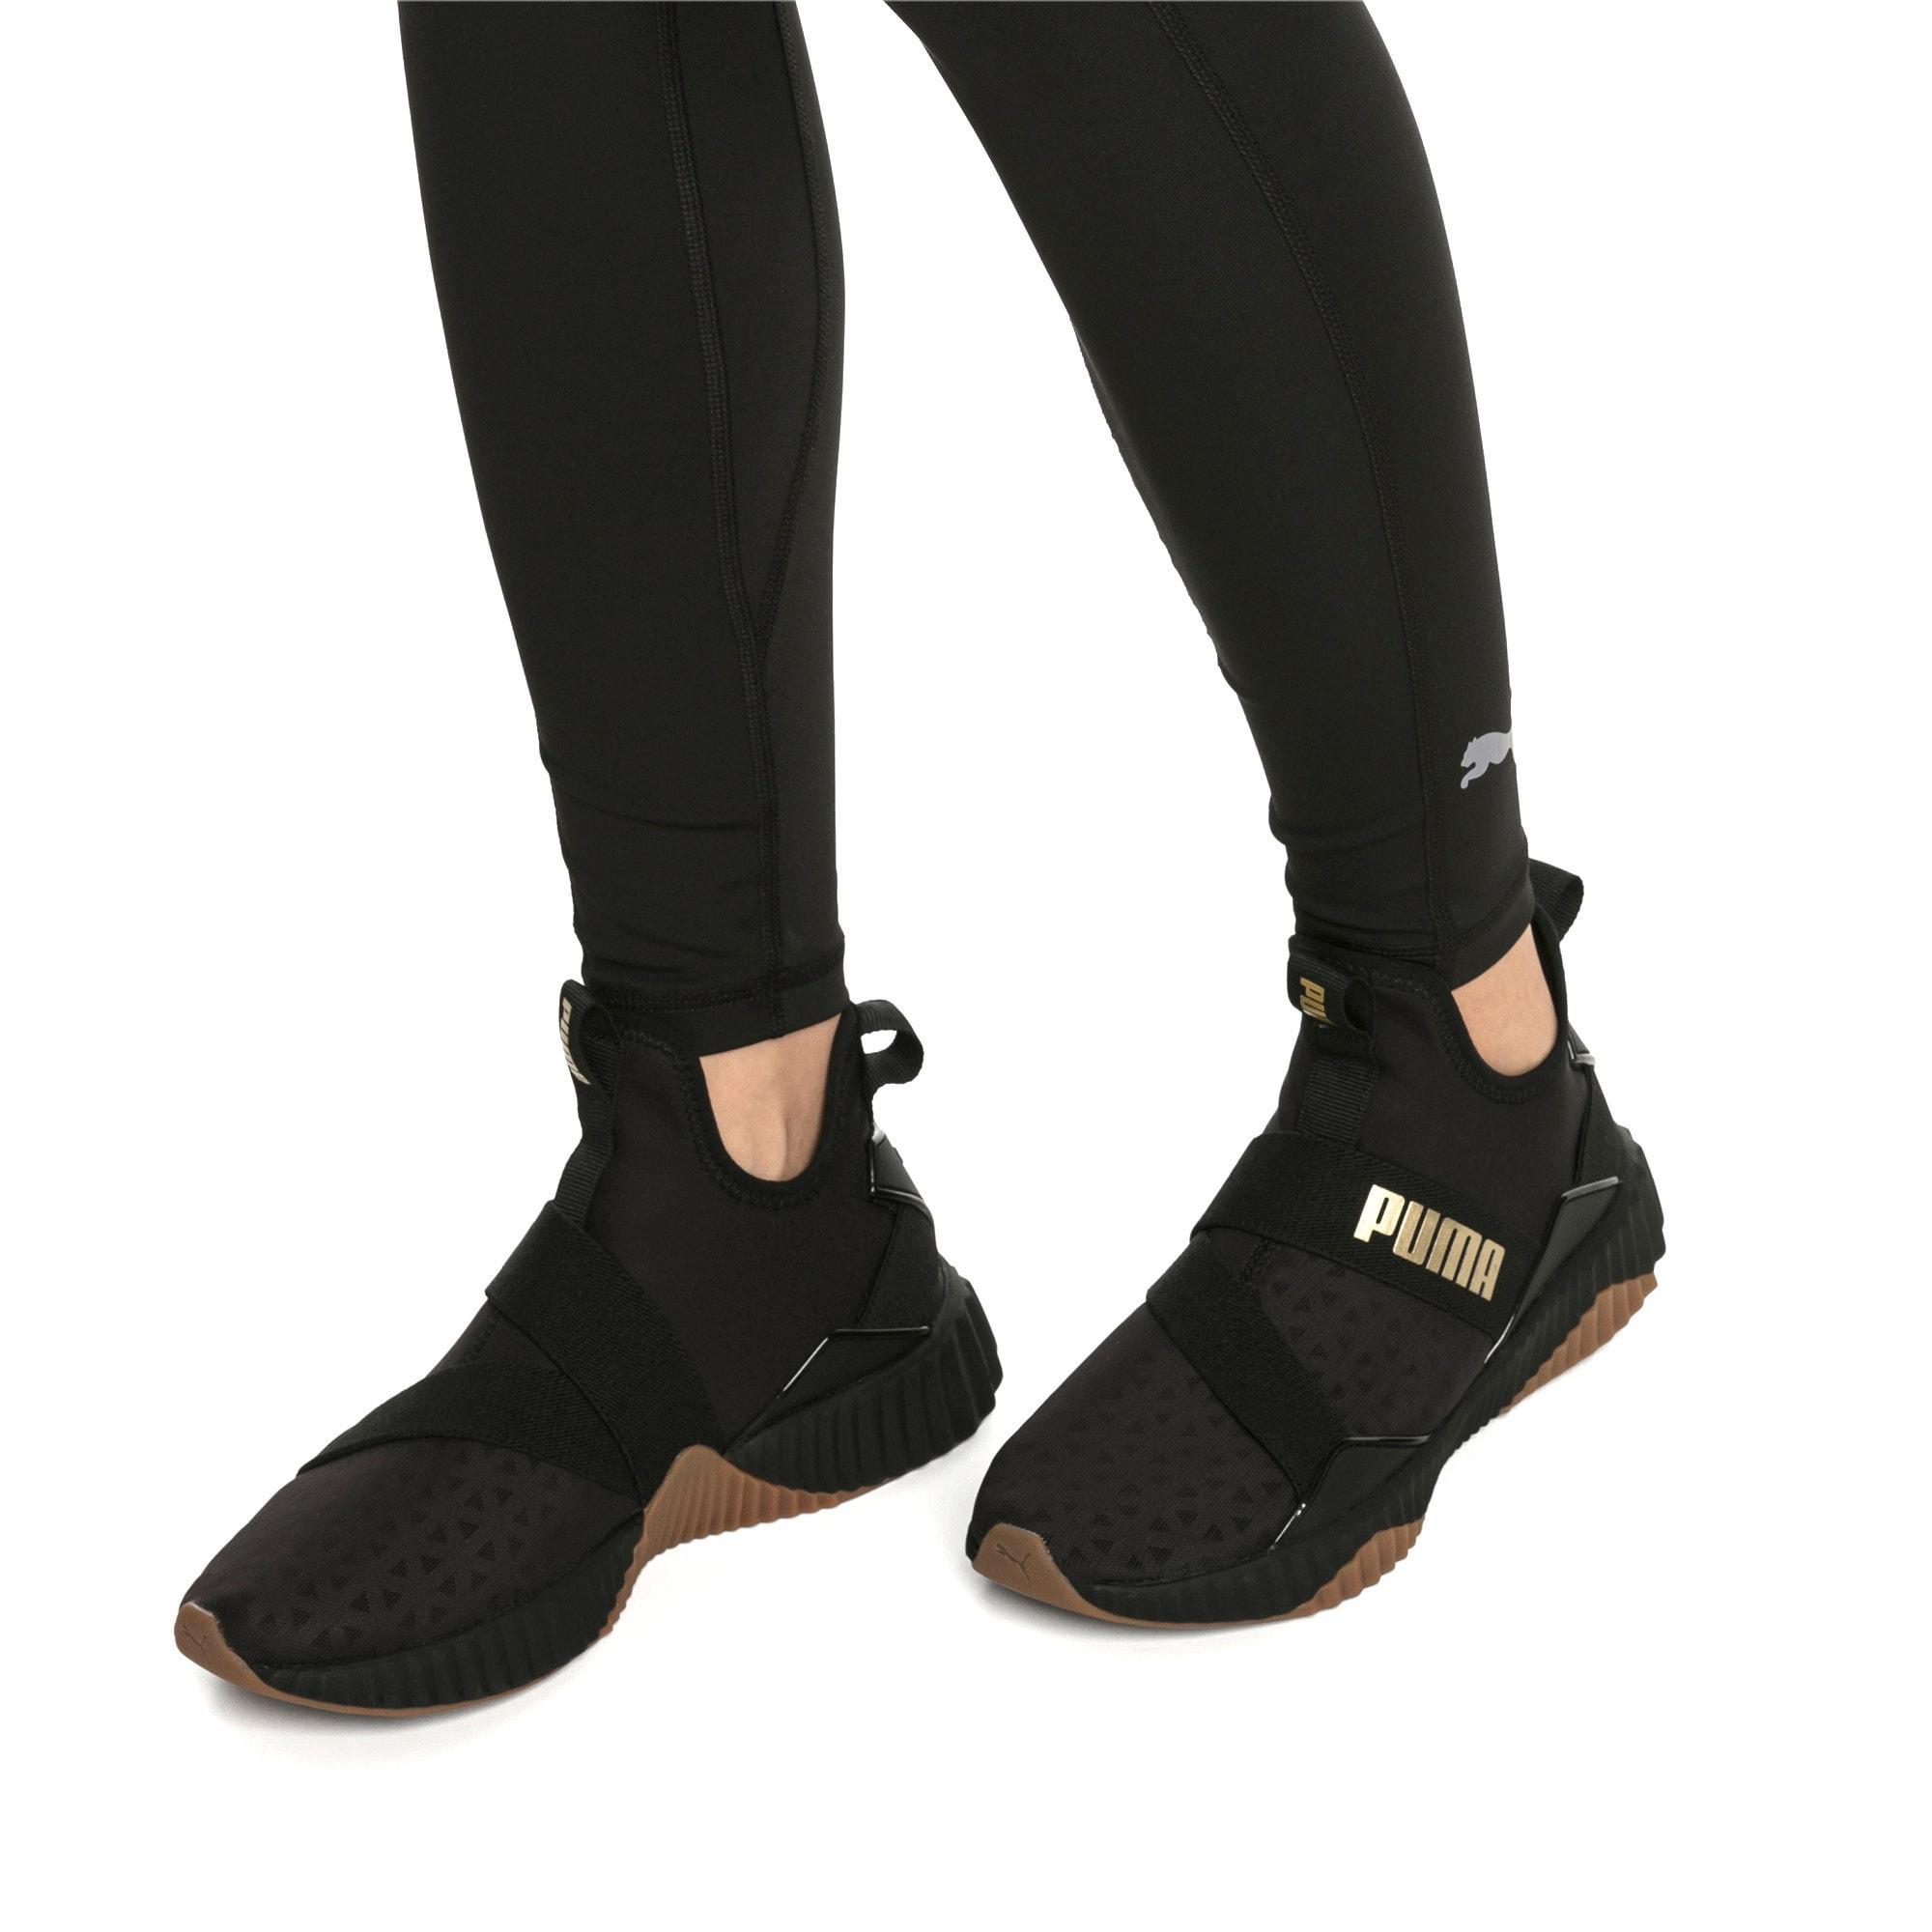 Thumbnail 2 of Defy Mid Sparkle Women's Training Shoes, Puma Black-Metallic Gold, medium